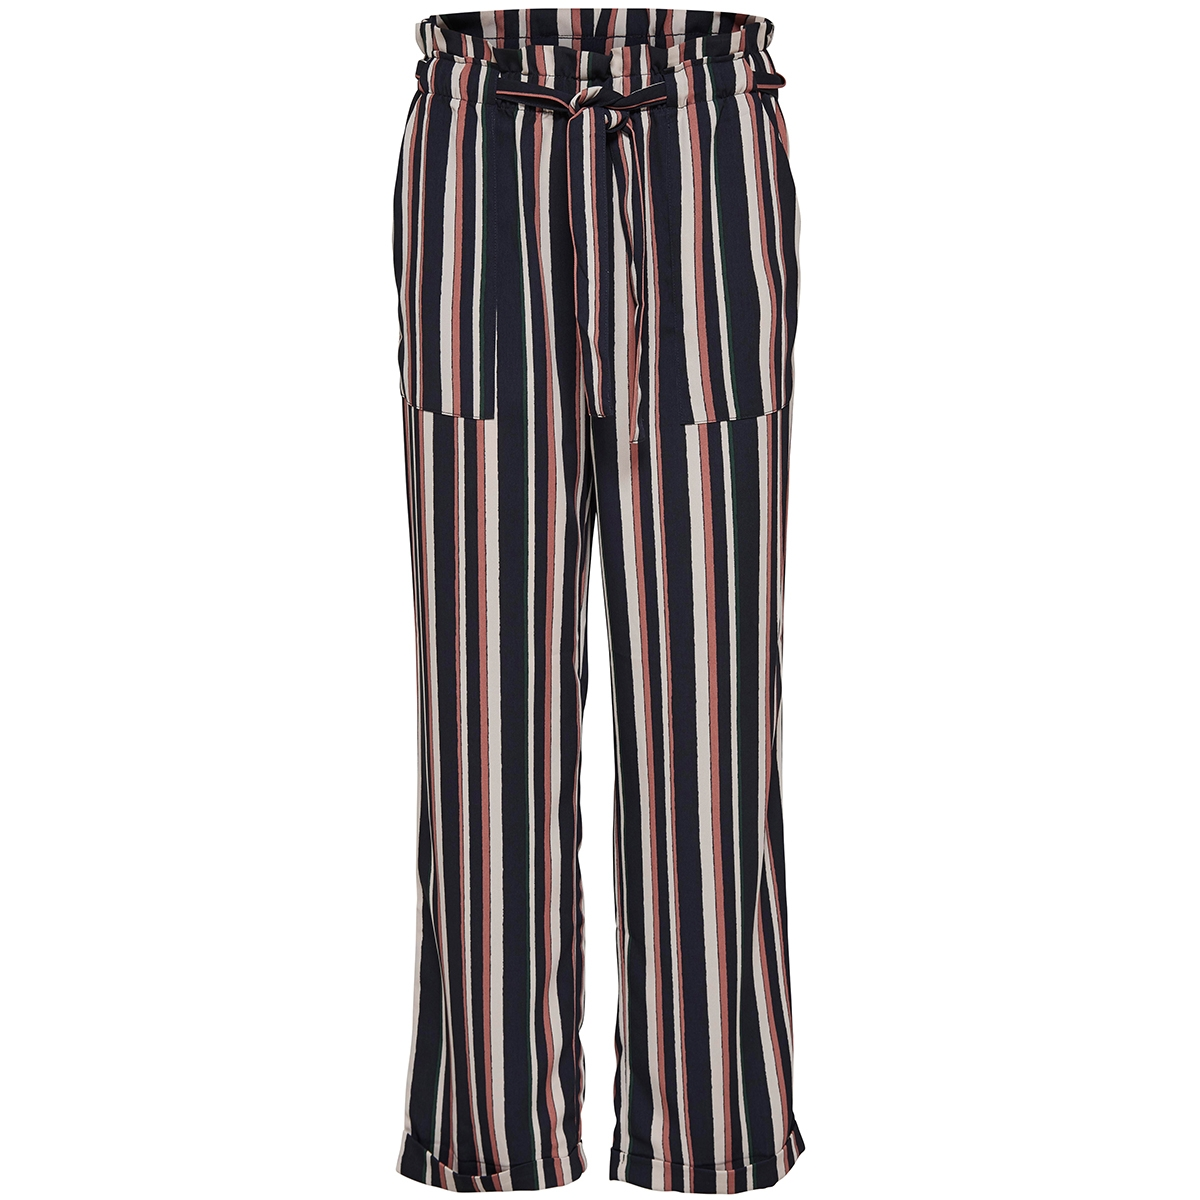 jdyanneline belt pant pnt 15147765 jacqueline de yong broek burlwood stripes/mona